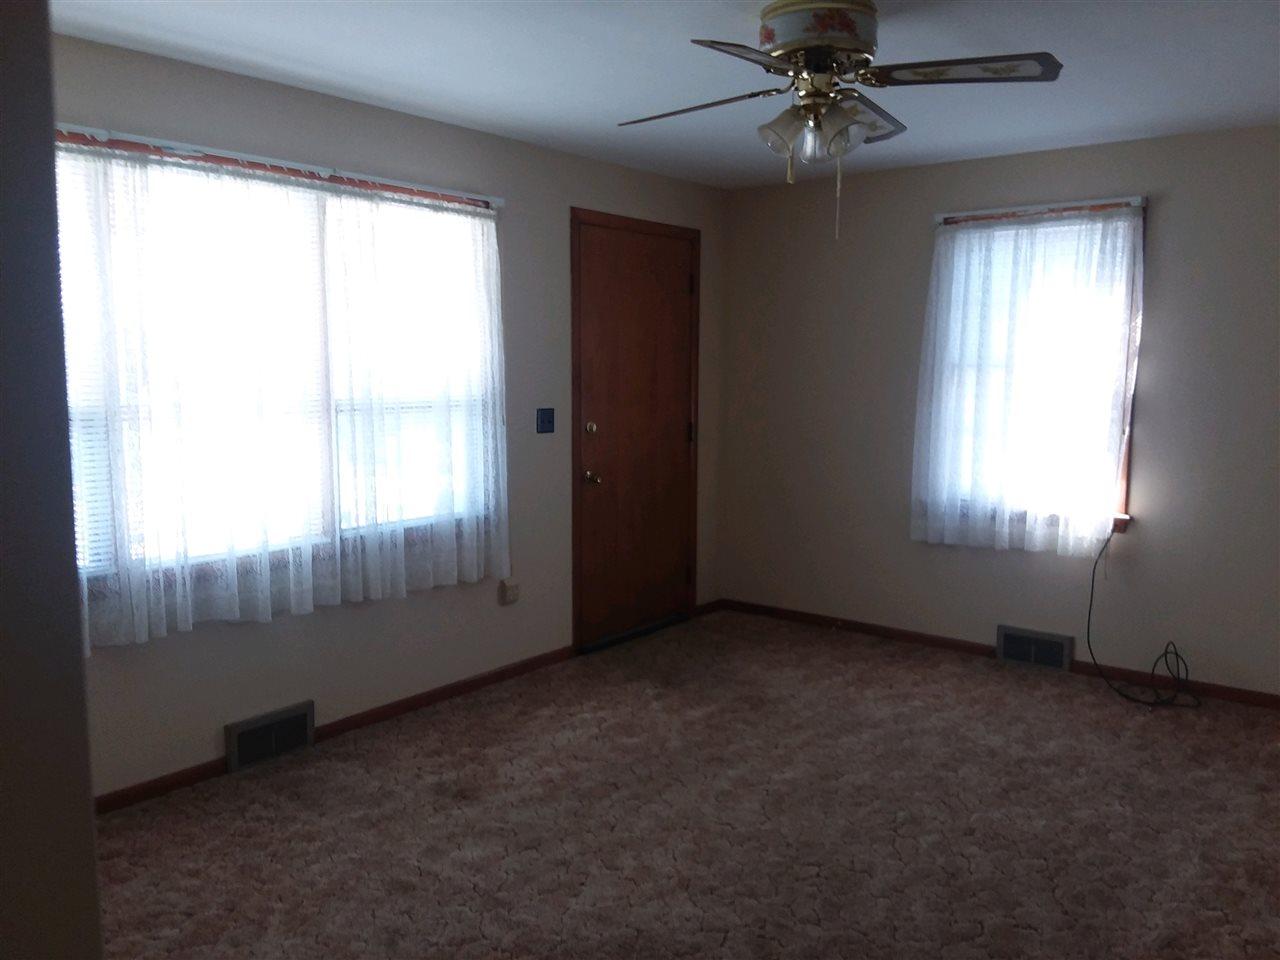 319 Sharon Ln, Staunton, VA, 24401